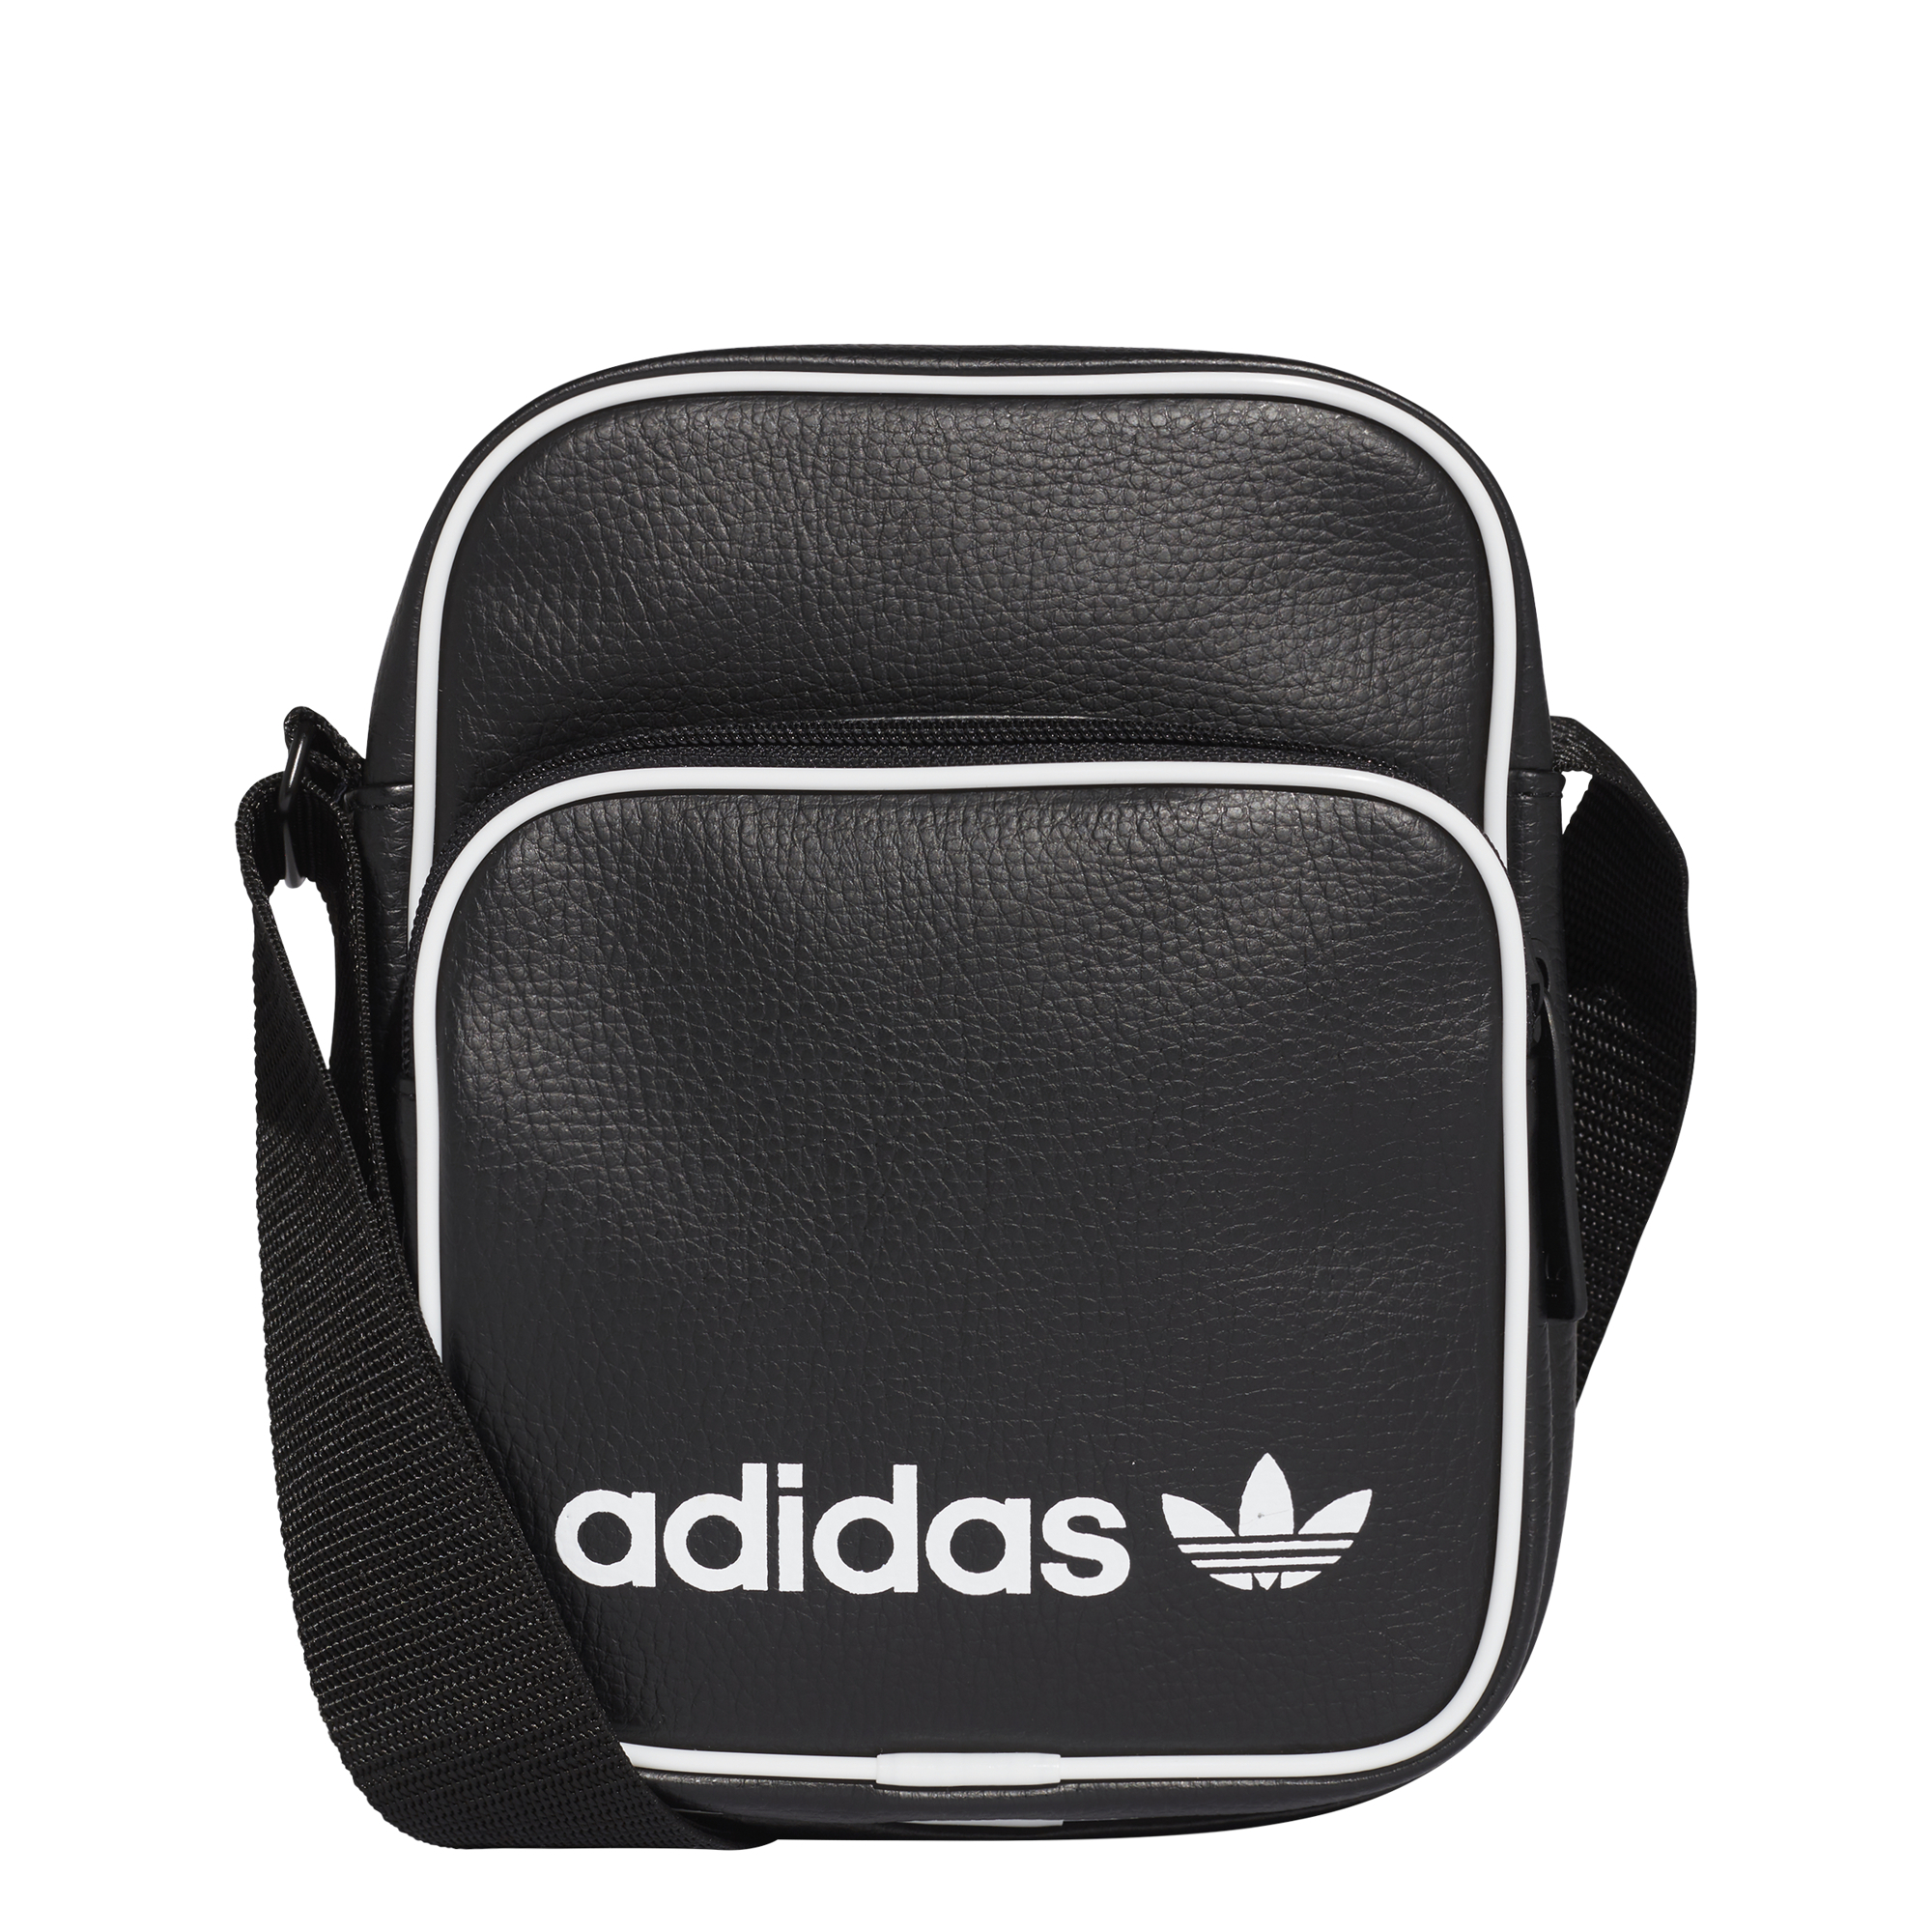 368ae55726f29 torebka adidas Mini Vintage DH1006 || timsport.pl - dodatkowe zniżki ...